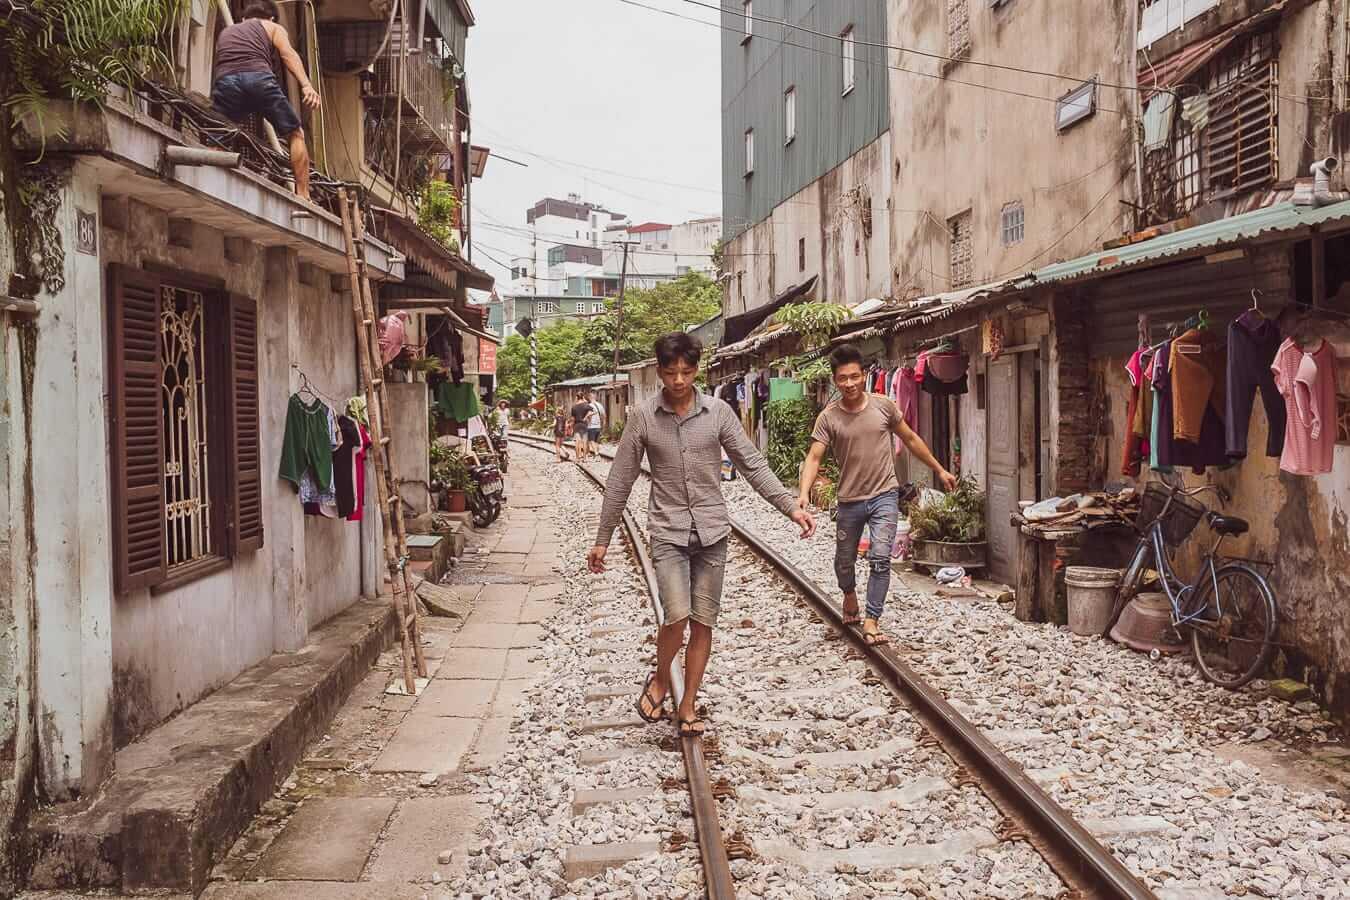 Hanoi's famous train street: Hanoi to Hoi An